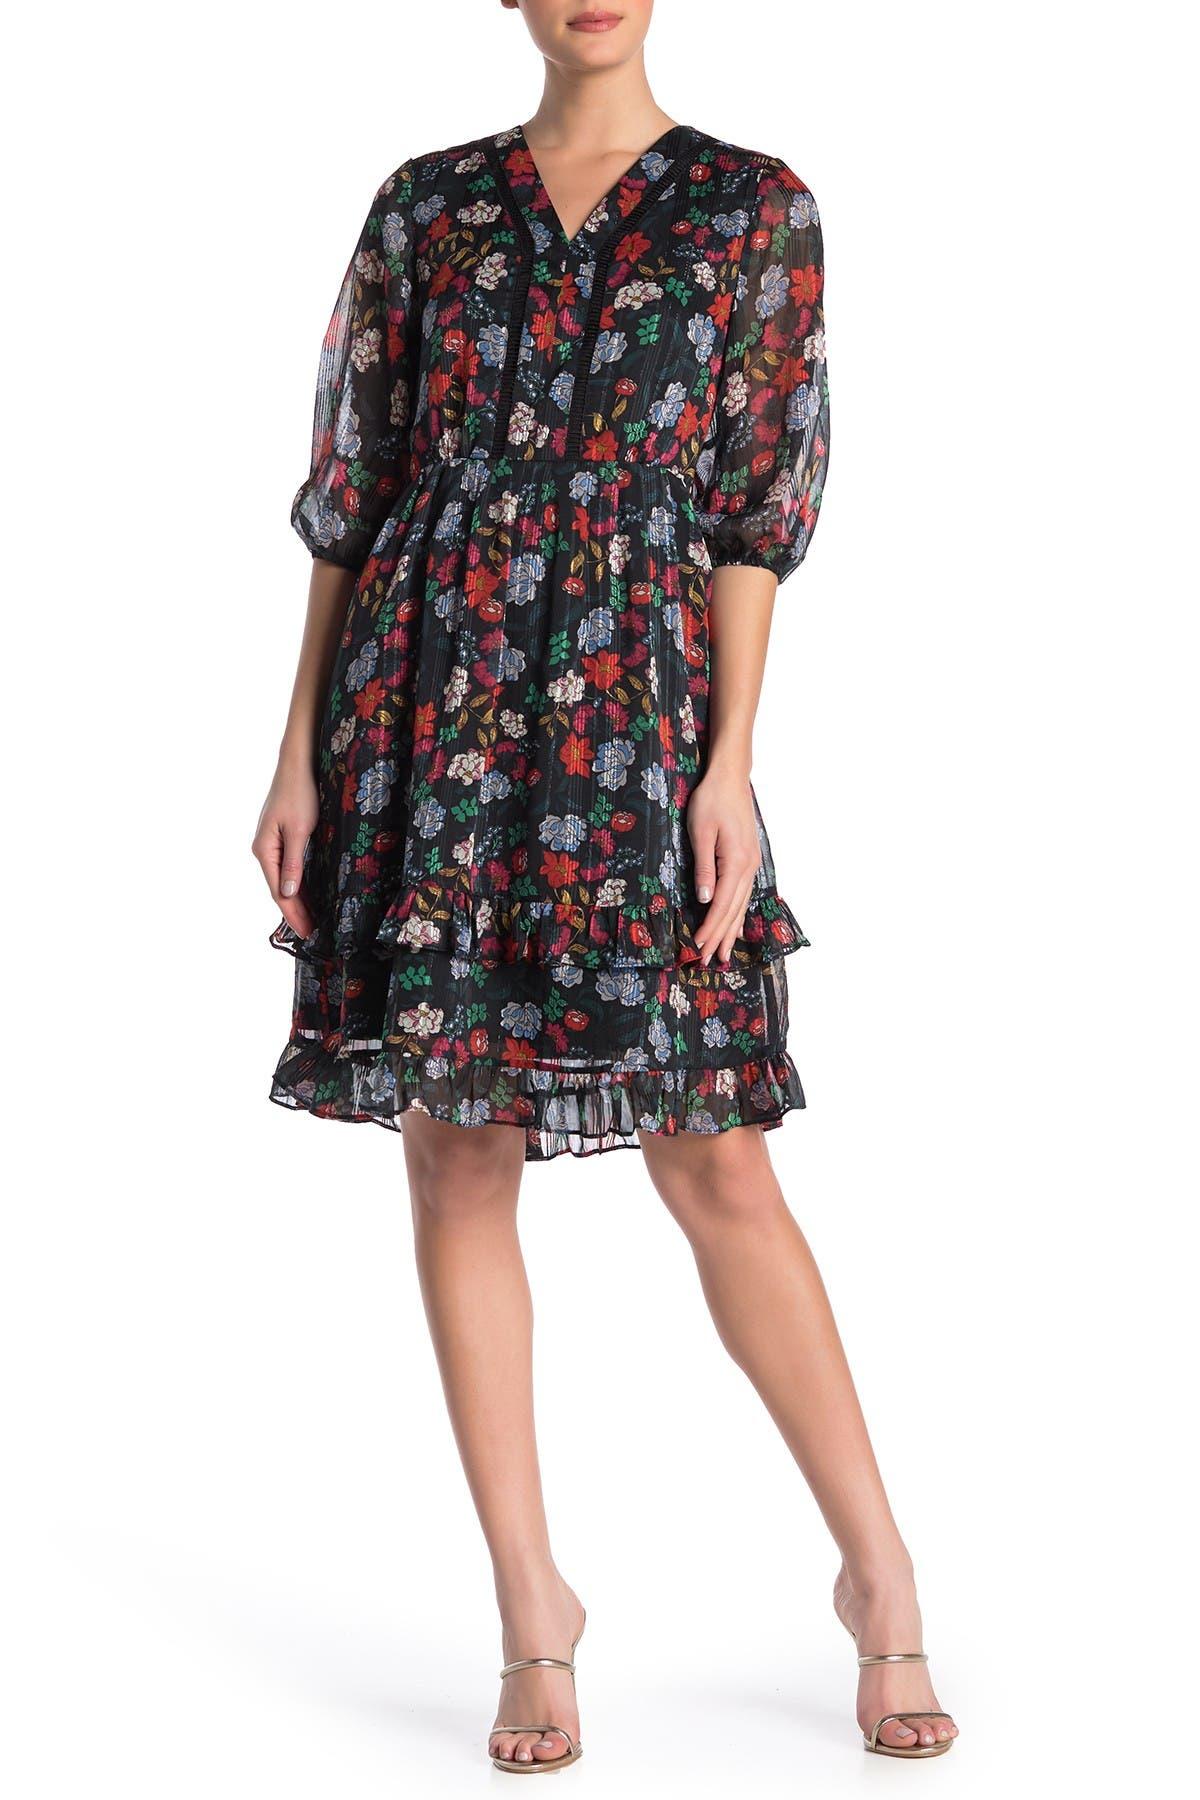 Image of NANETTE nanette lepore V-Neck Elbow Length Sleeve Floral Print Dress